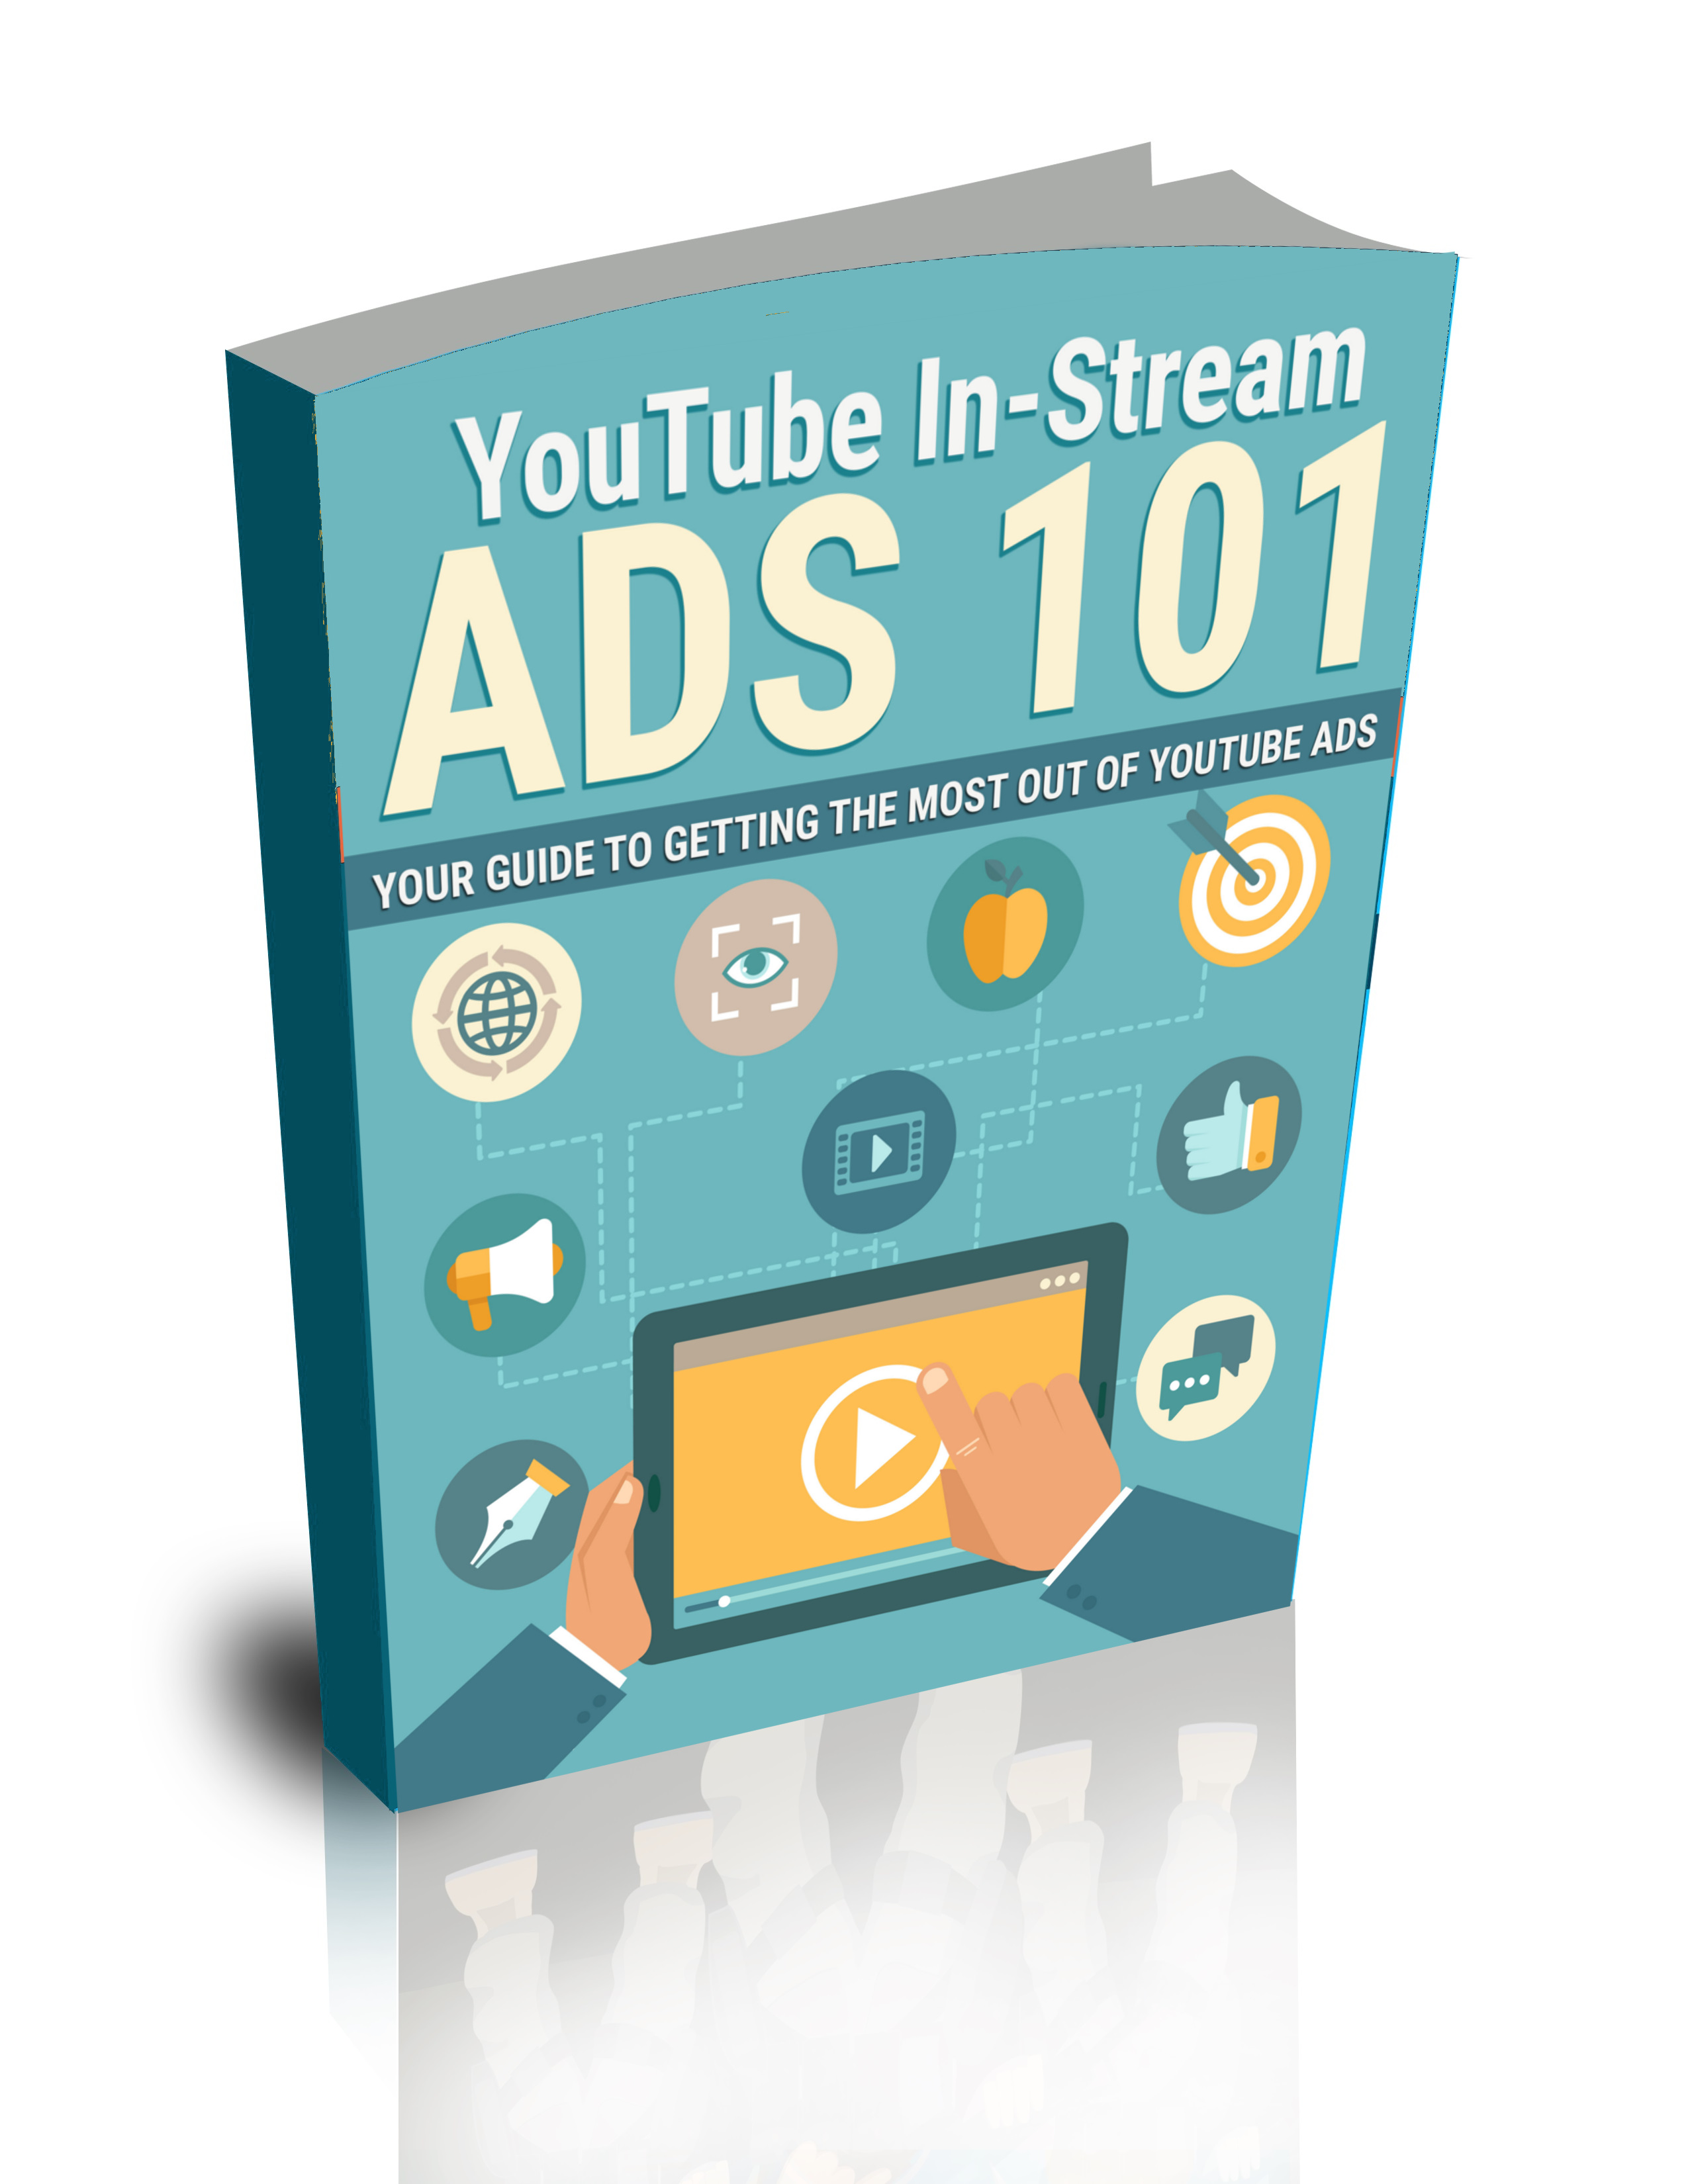 youtubeinstreamads101